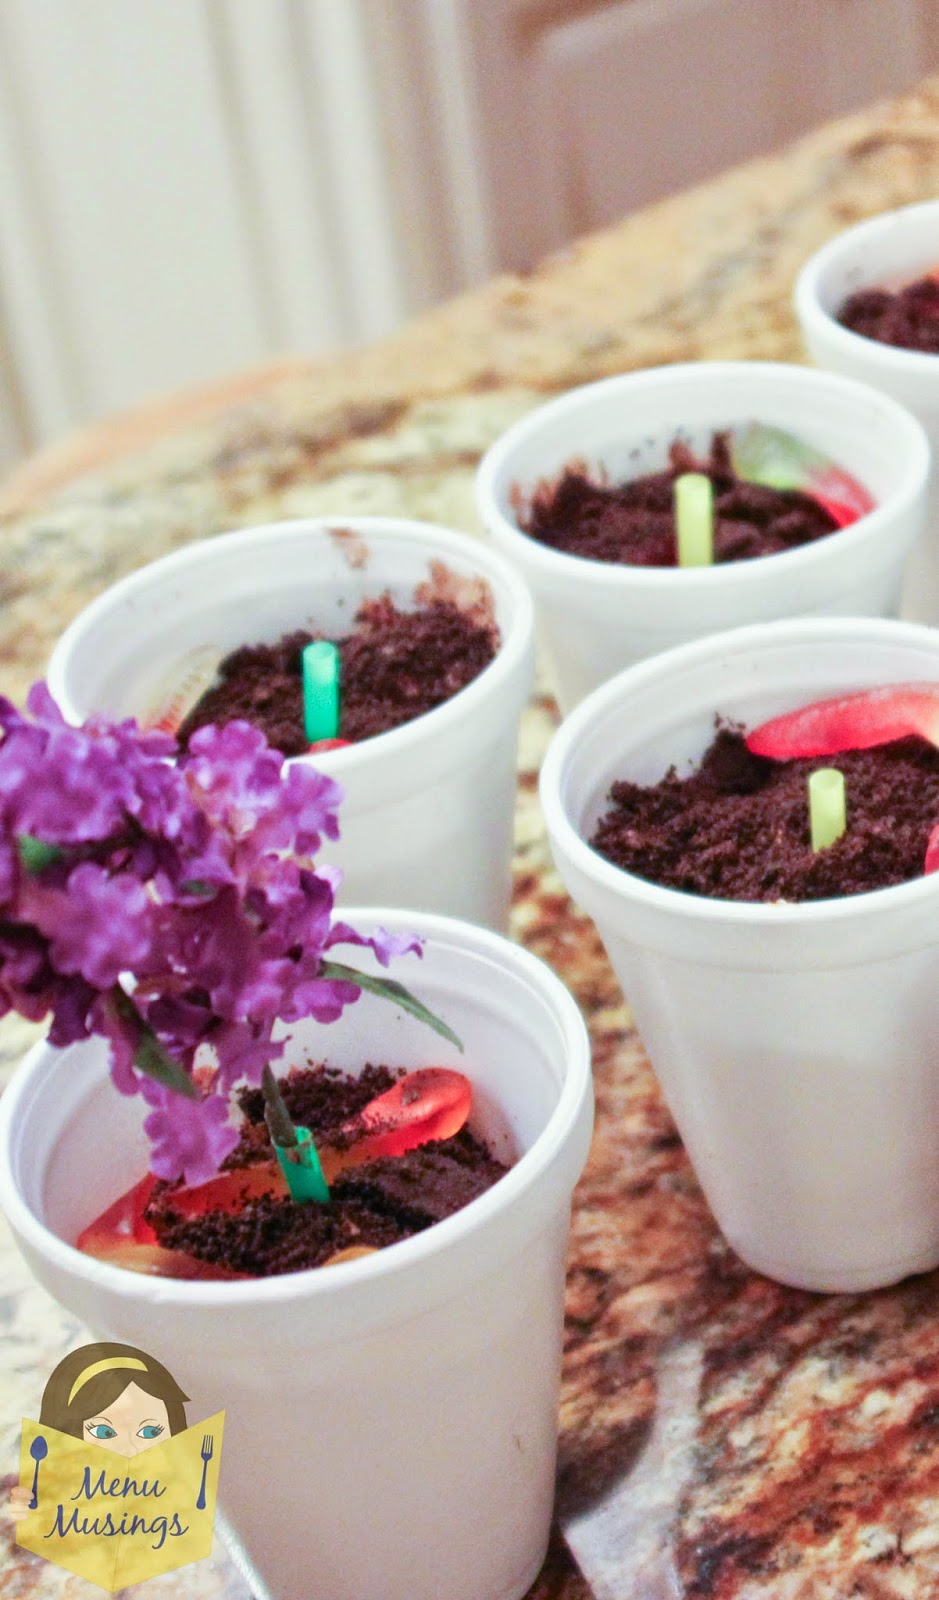 Oreo Dirt Cake Dessert Cups @ menumusings.com